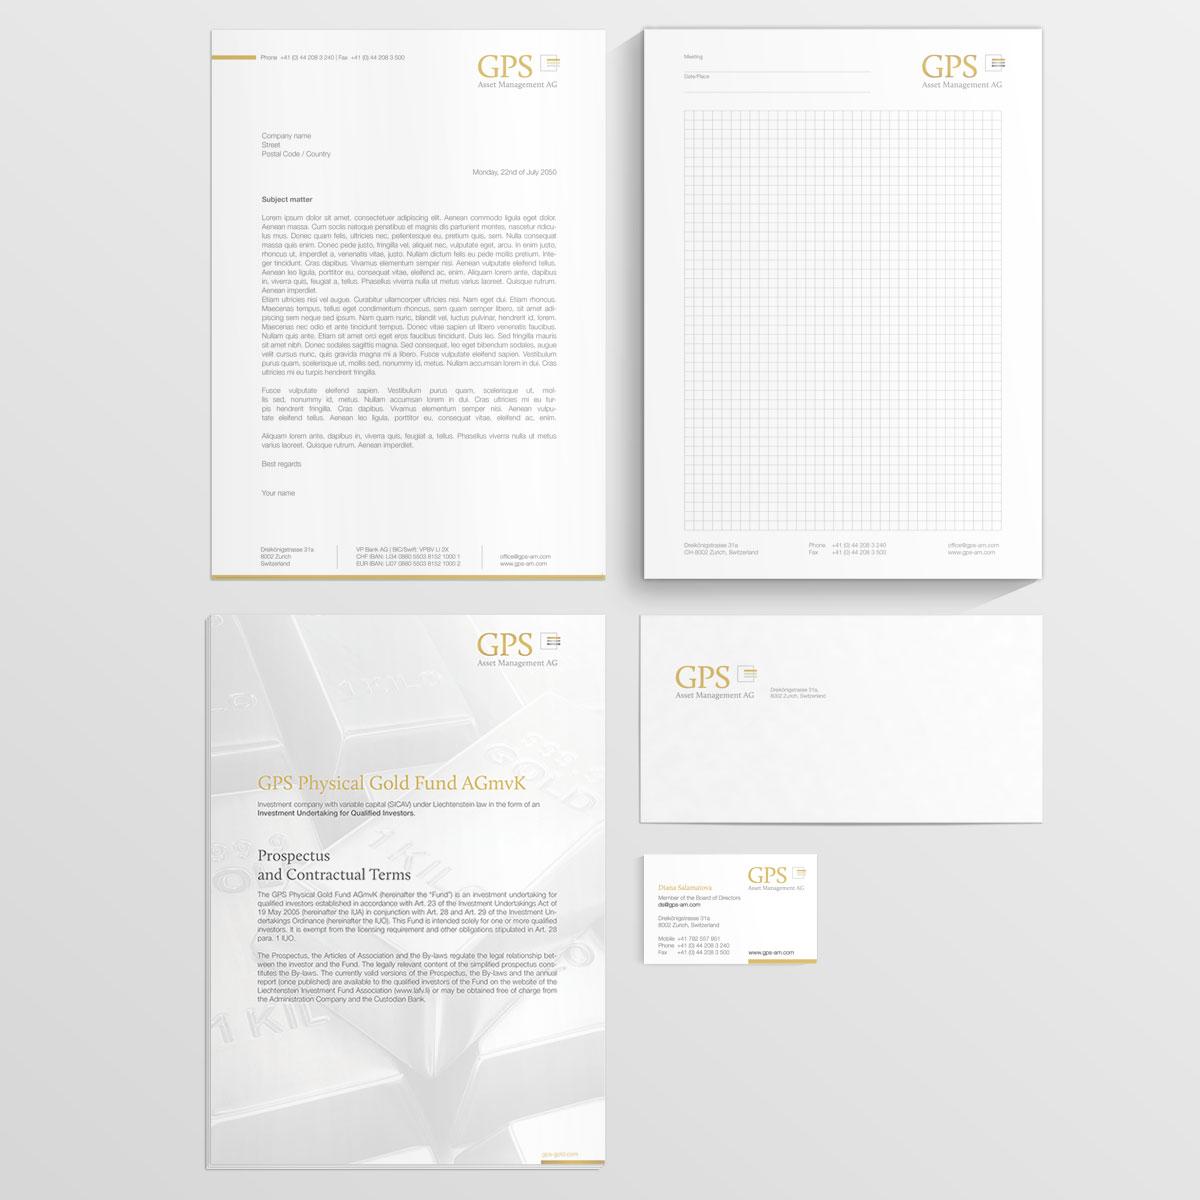 Stationary Design und Fund Documents GPS Asset Management AG - IPR Consulting Establishment